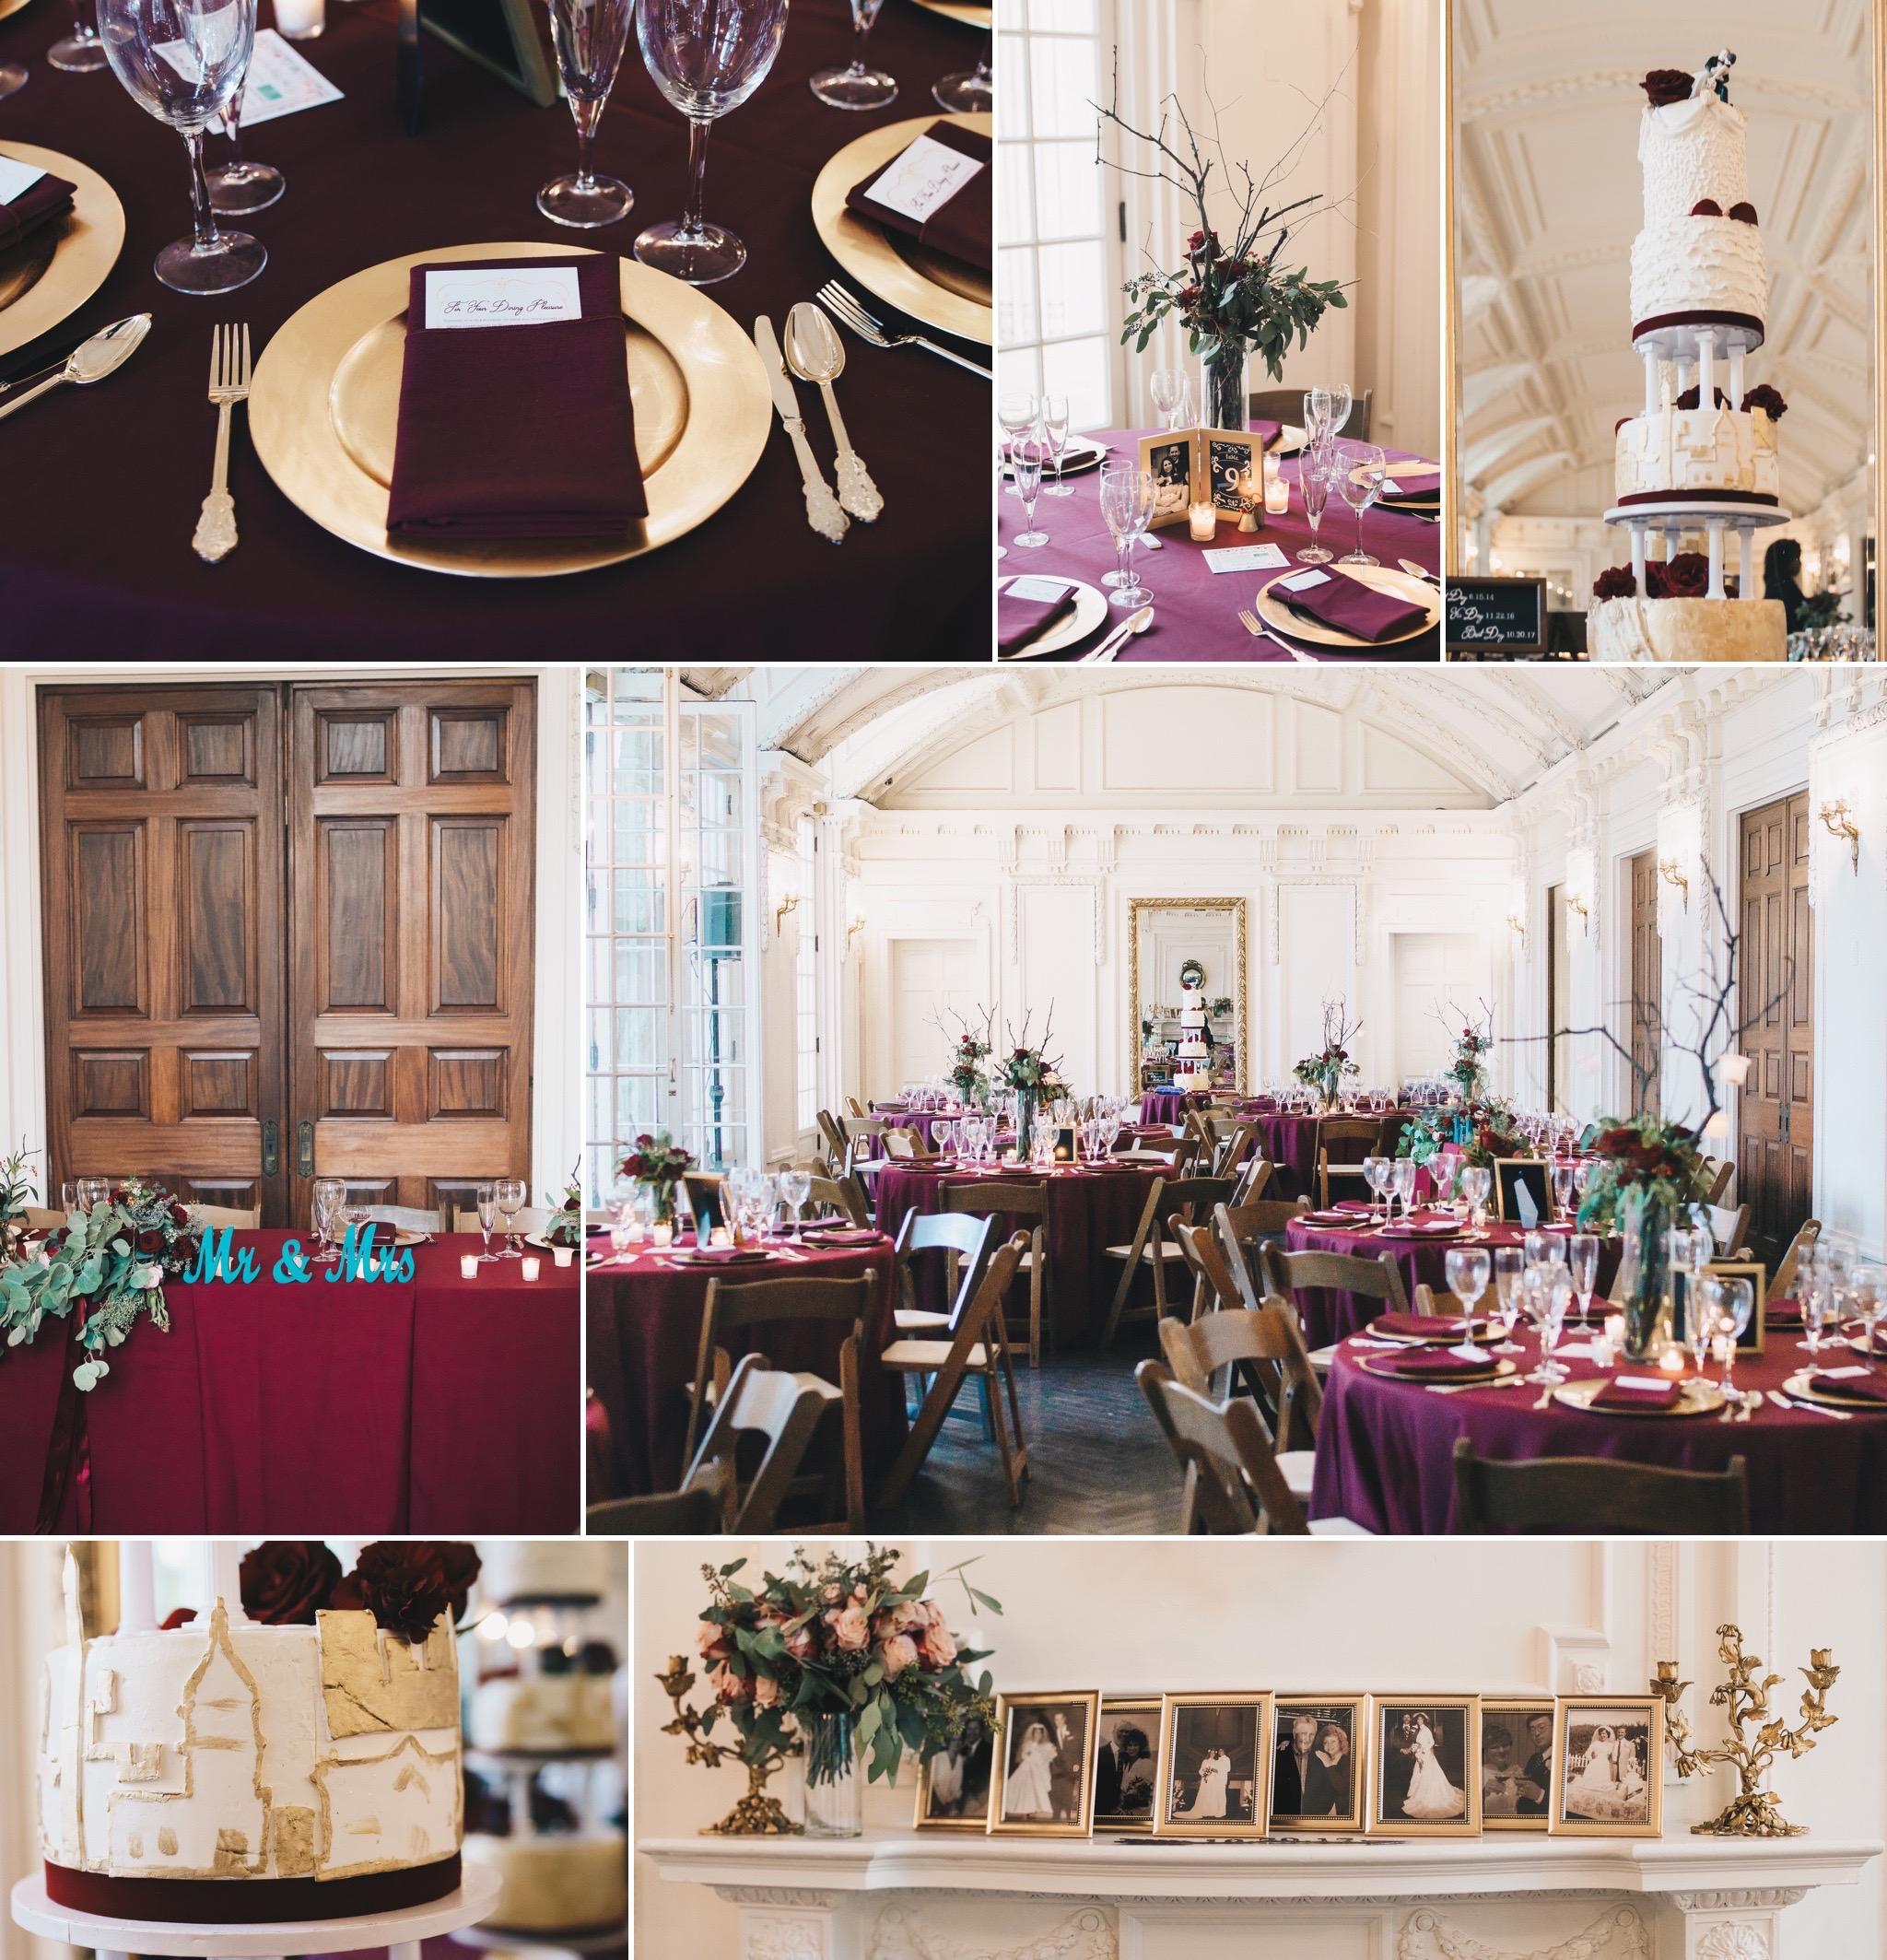 Nathan Elaina Romantic Capitol Wedding in Washington DC by Jonathan Hannah Photography12.jpg